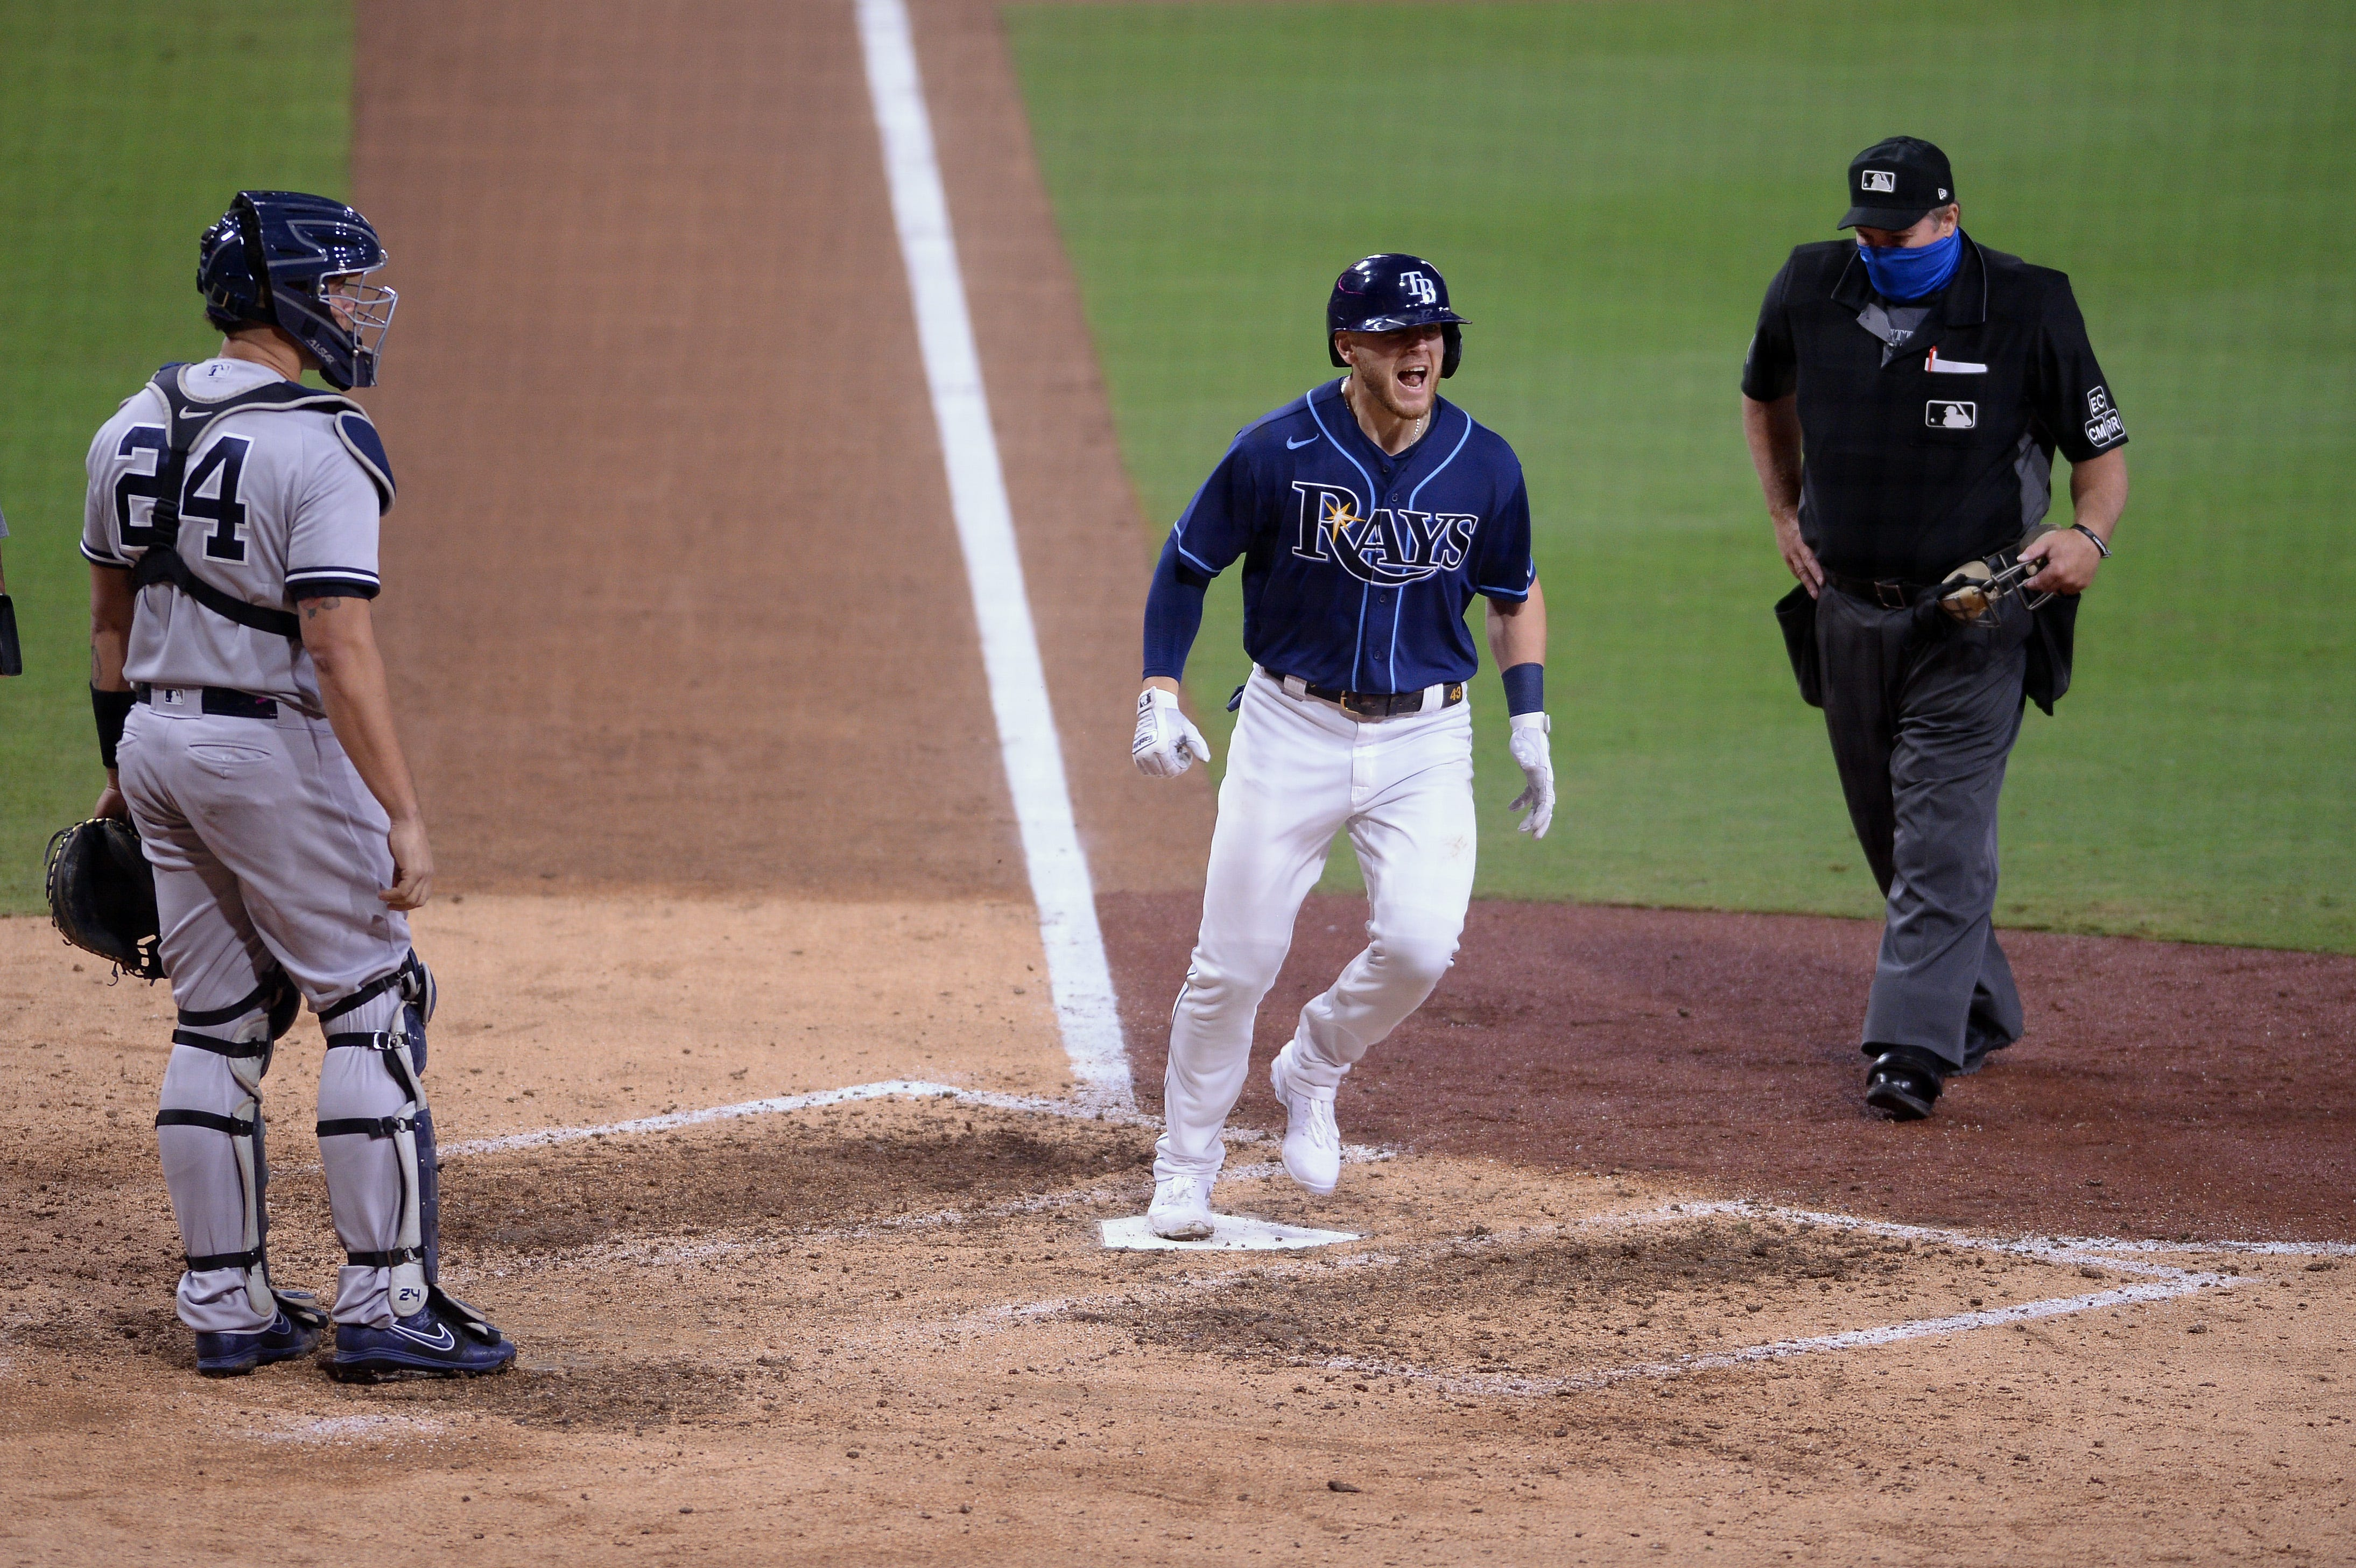 Opinion: Mike Brosseau powers Rays into ALCS by getting revenge vs. Yankees' Aroldis Chapman